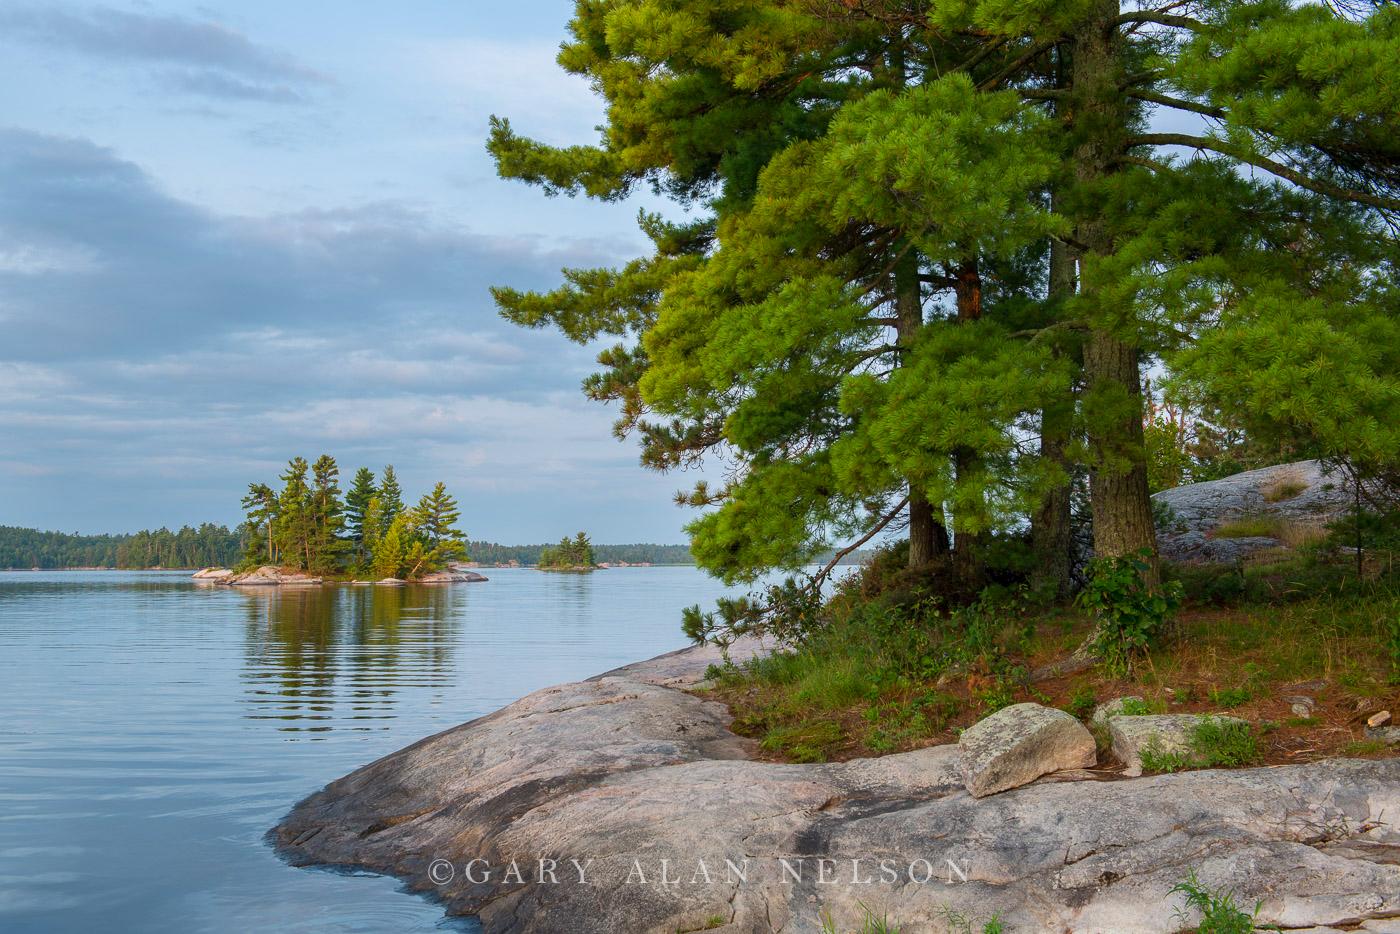 minnesota, voyageurs national park, island, white pines, photo